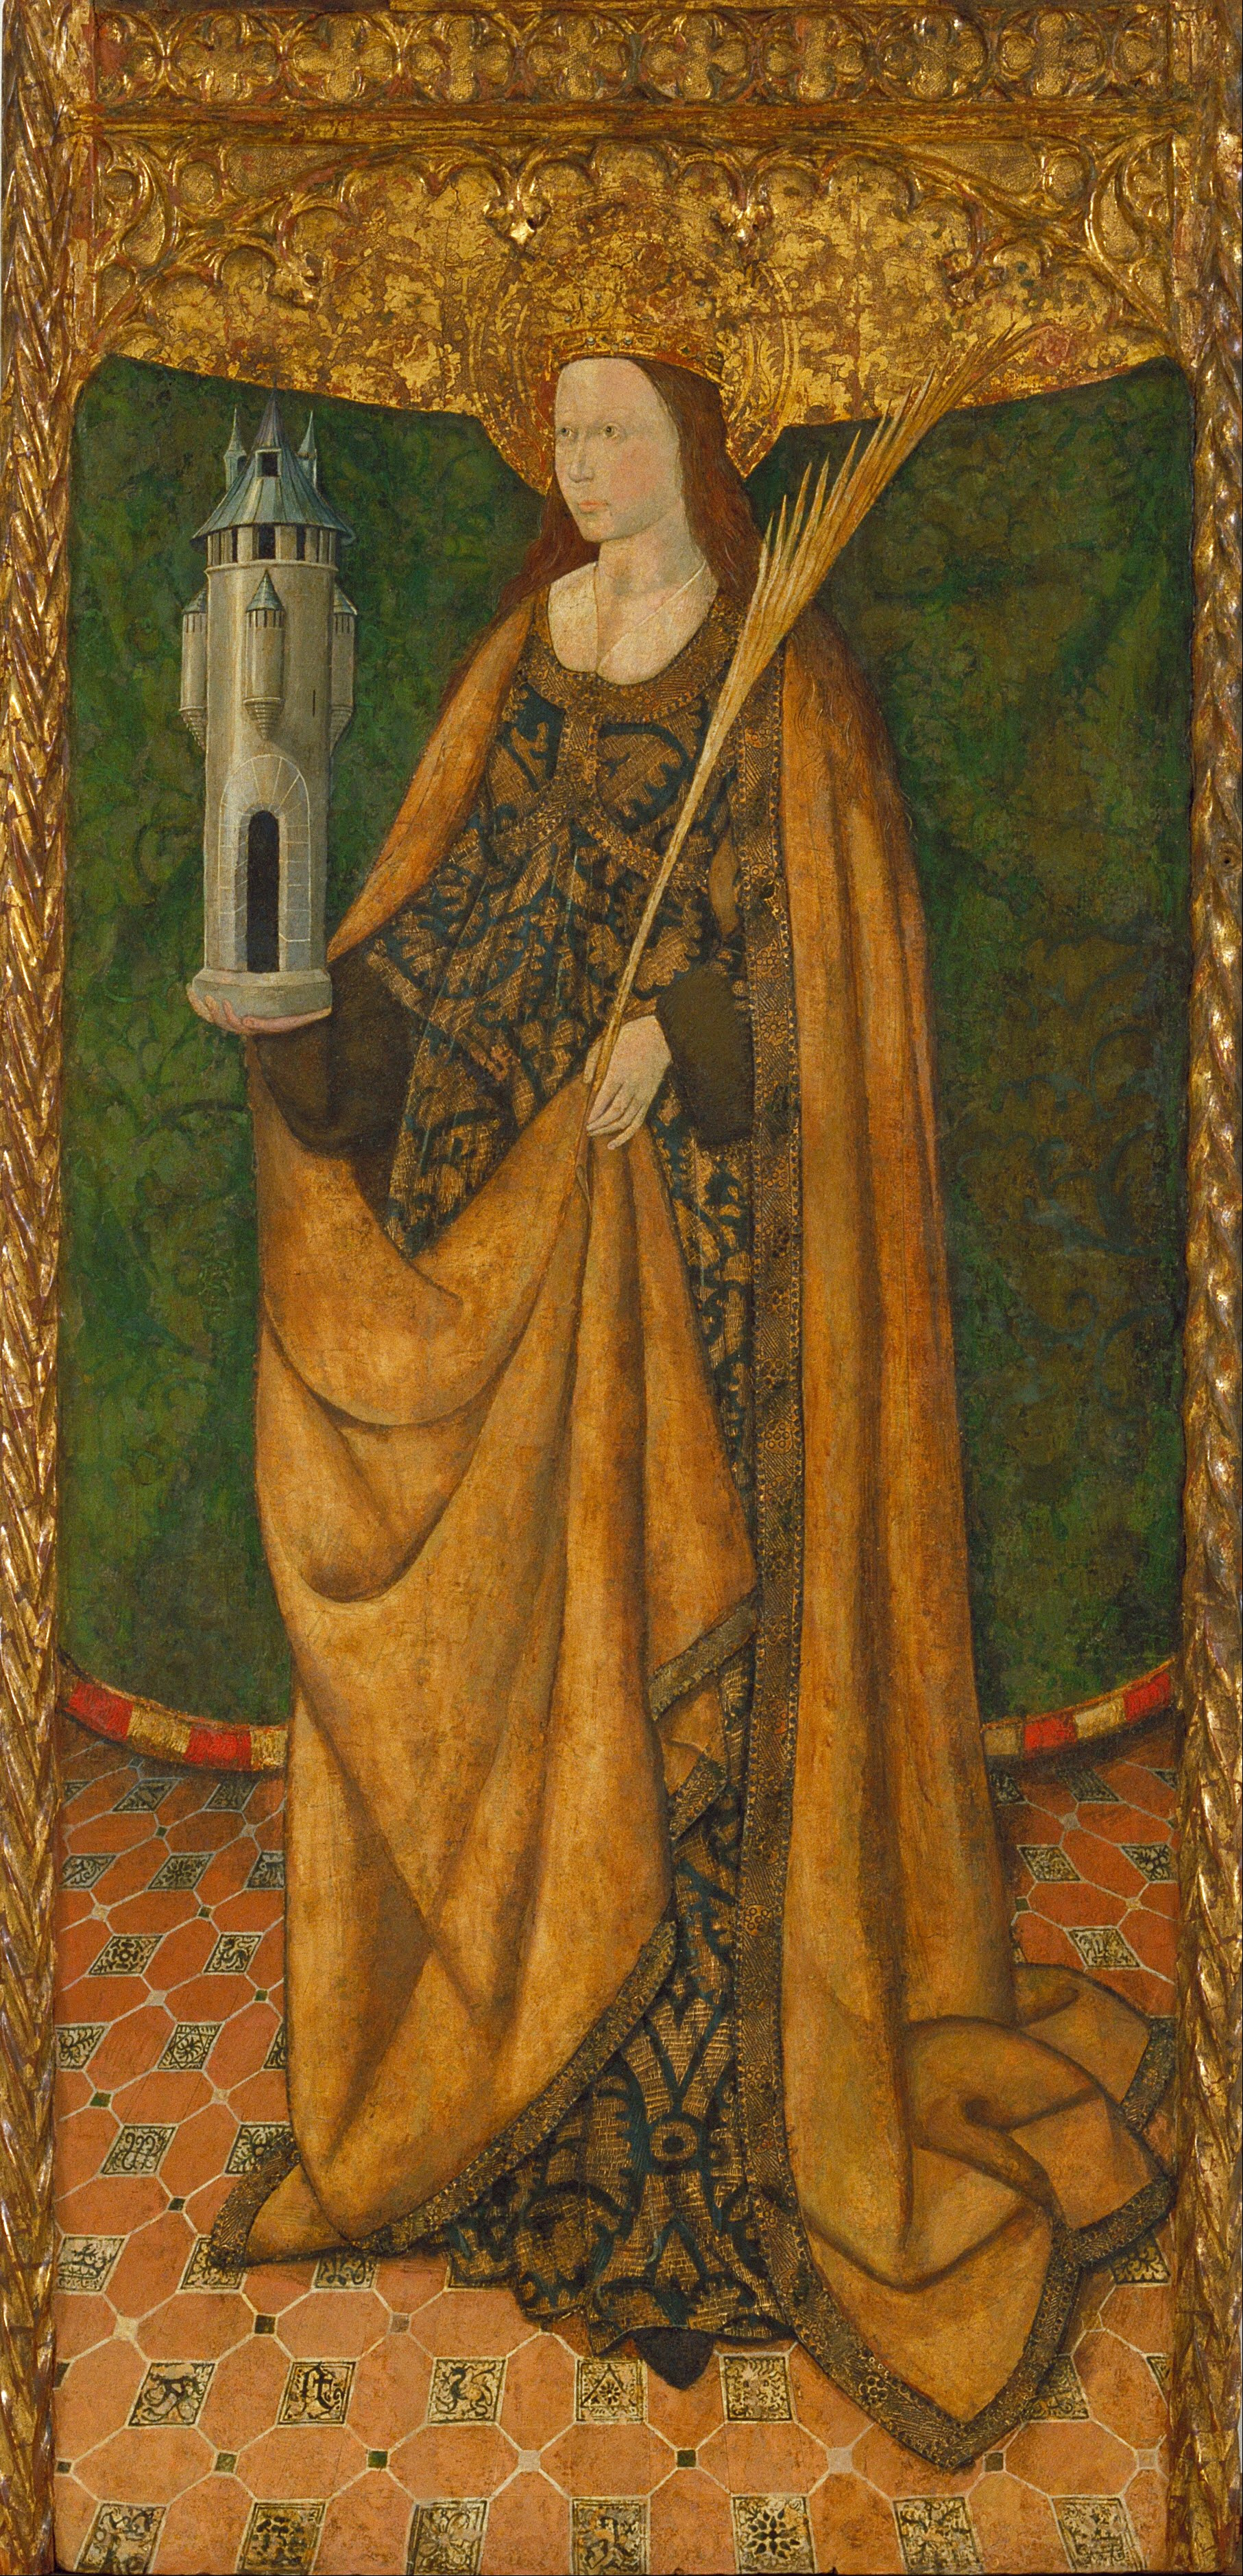 File:Saint Barbara - Google Art Project.jpg - Wikimedia Commons